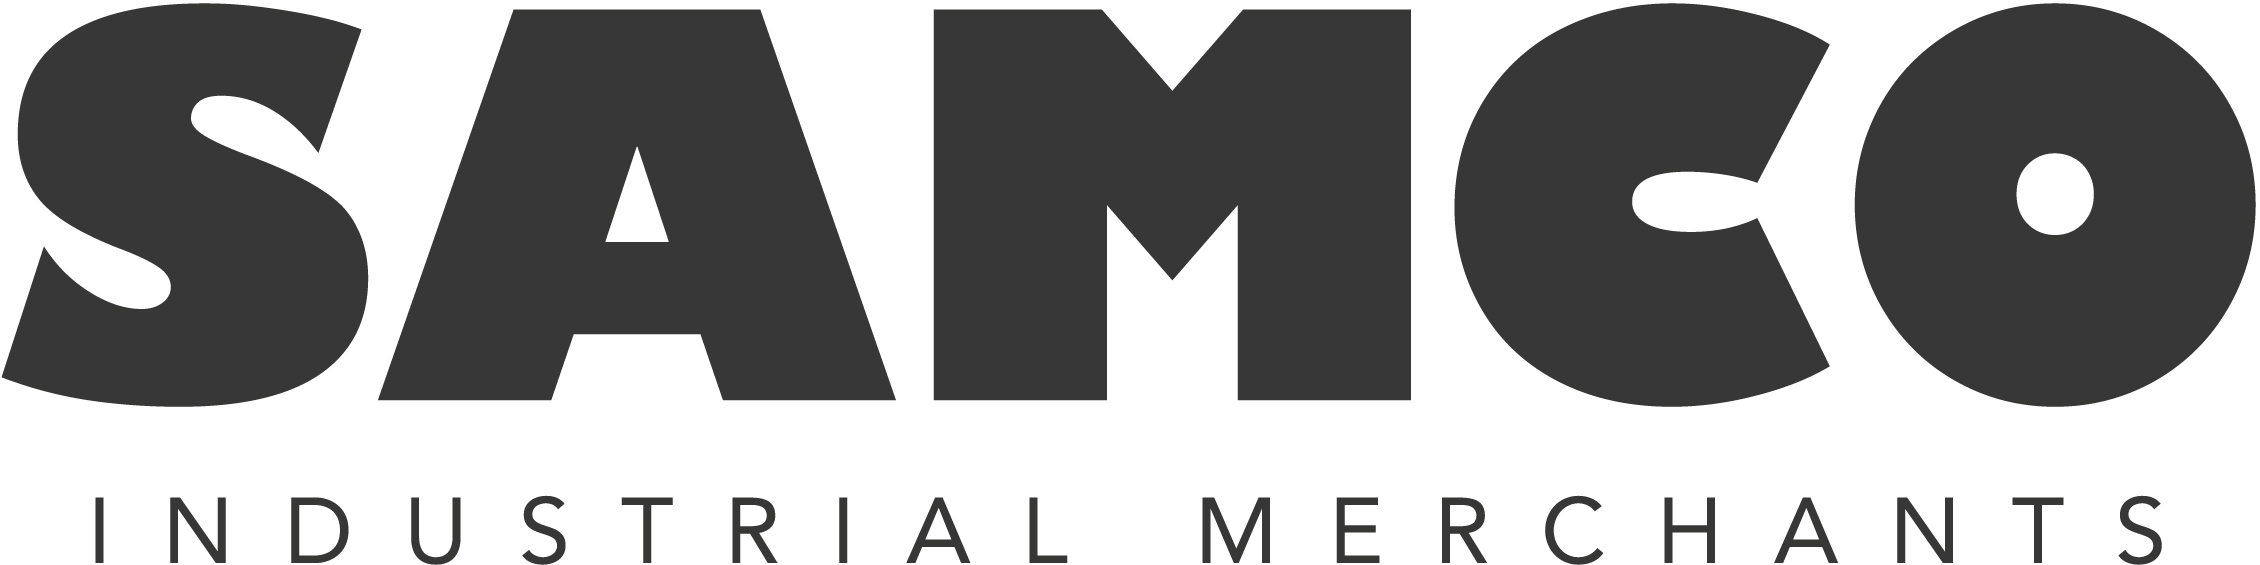 Samco-Logo